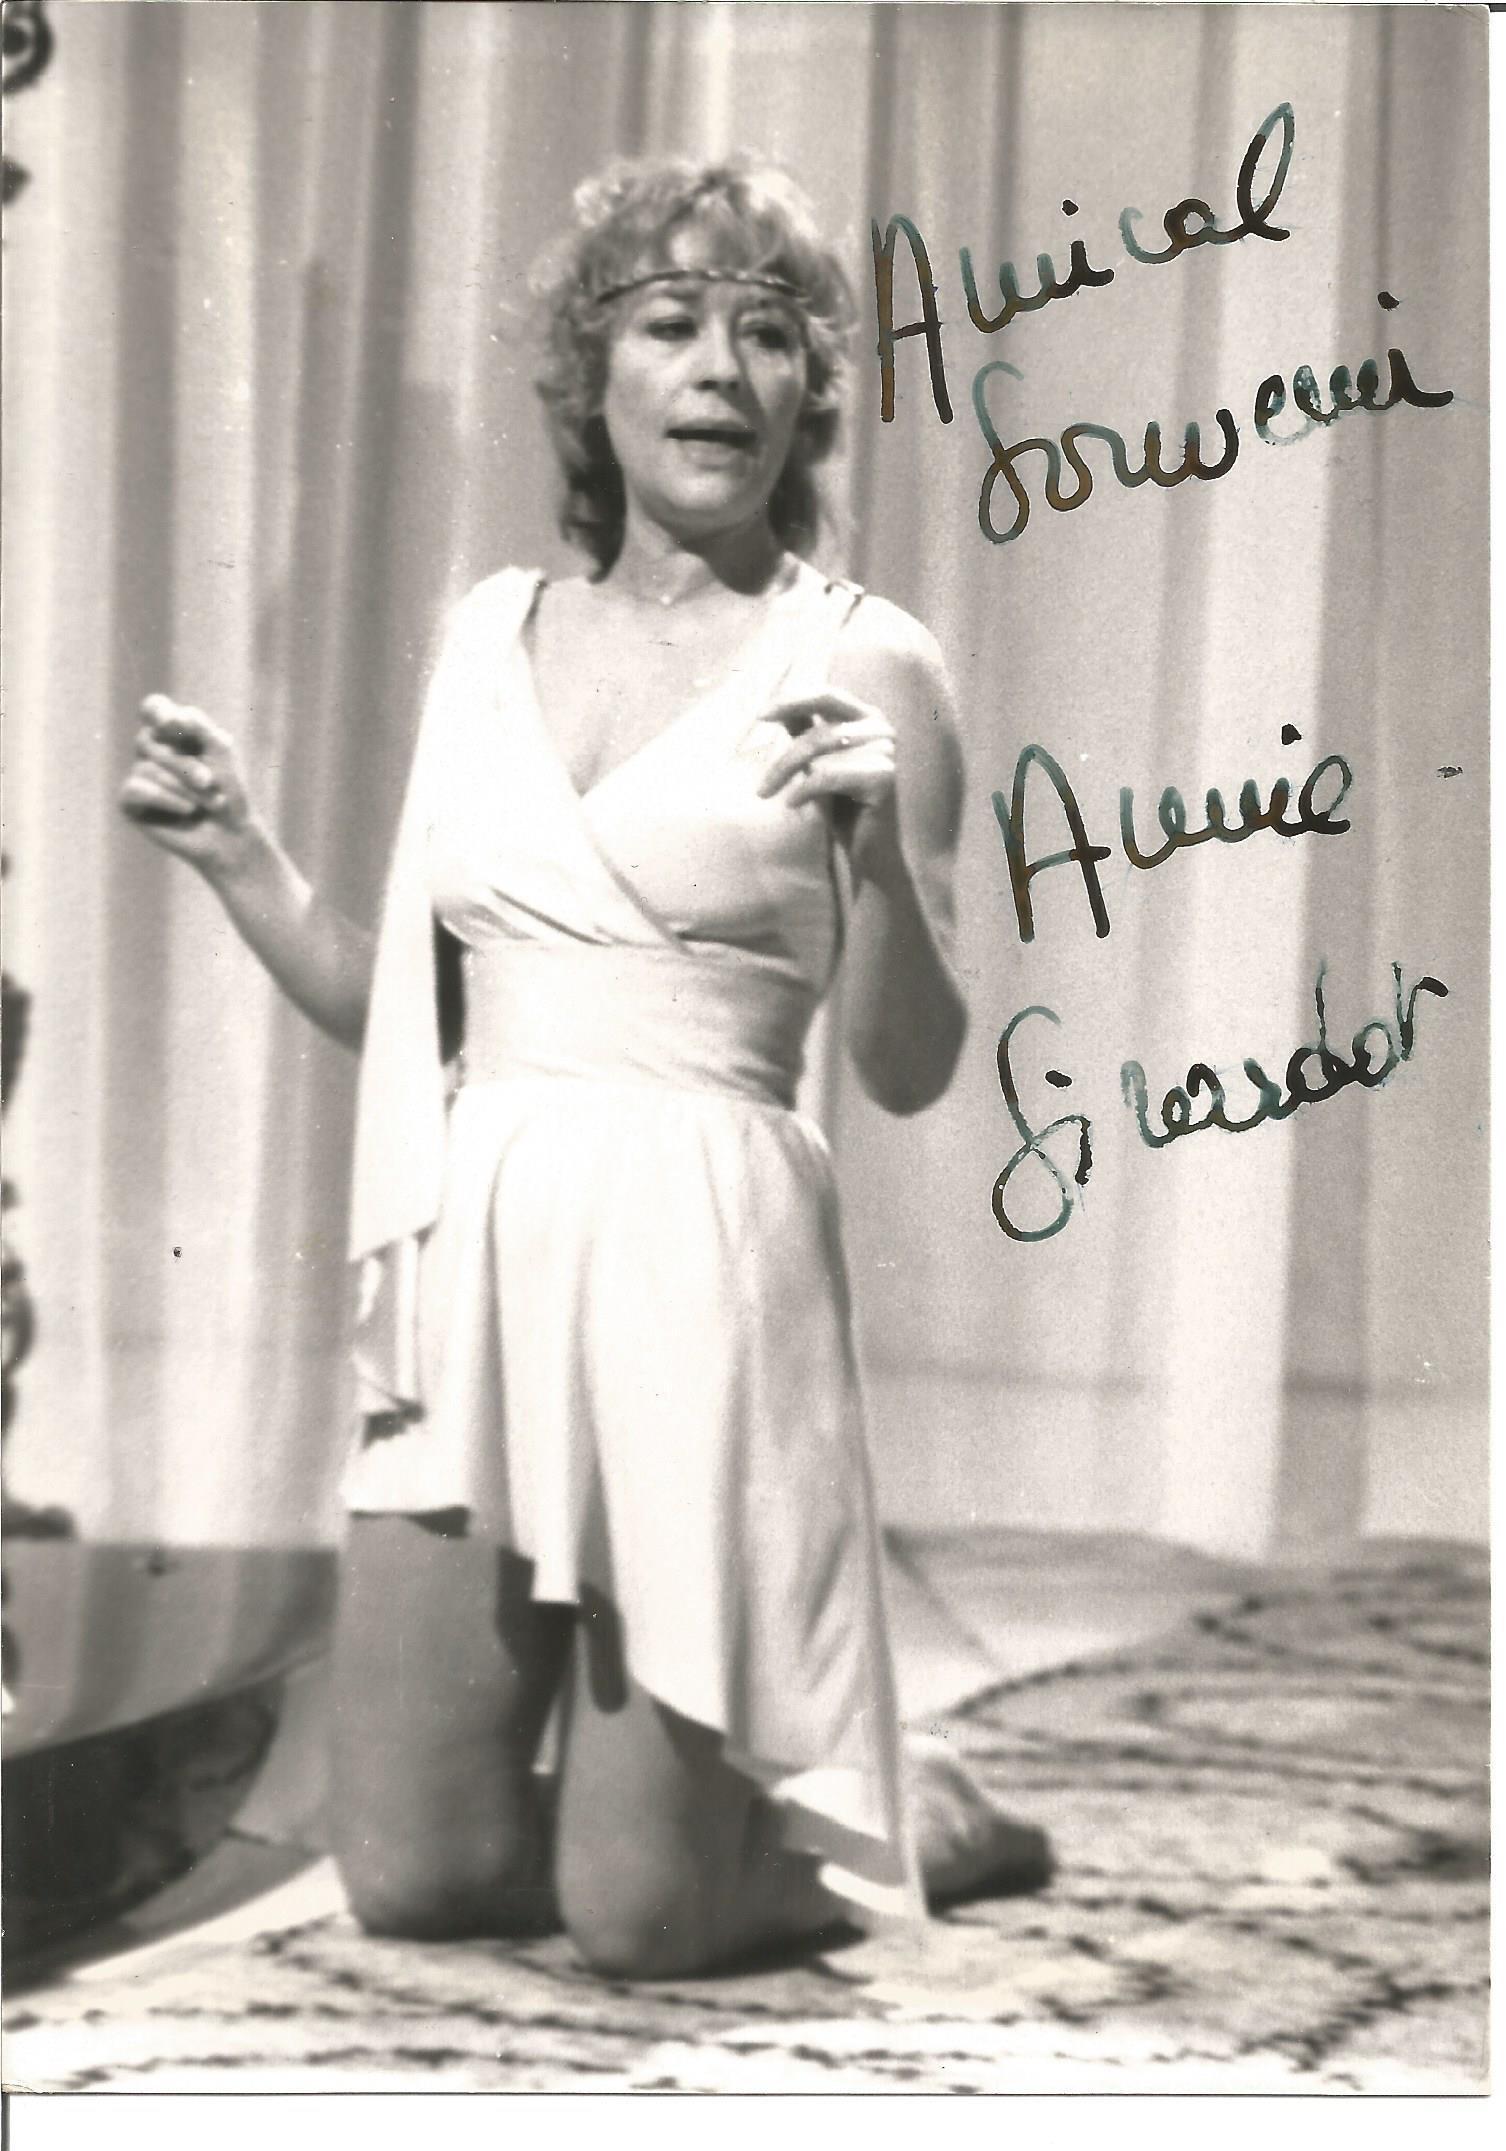 Annie Giradot signed 7x5 black and white photo. Good